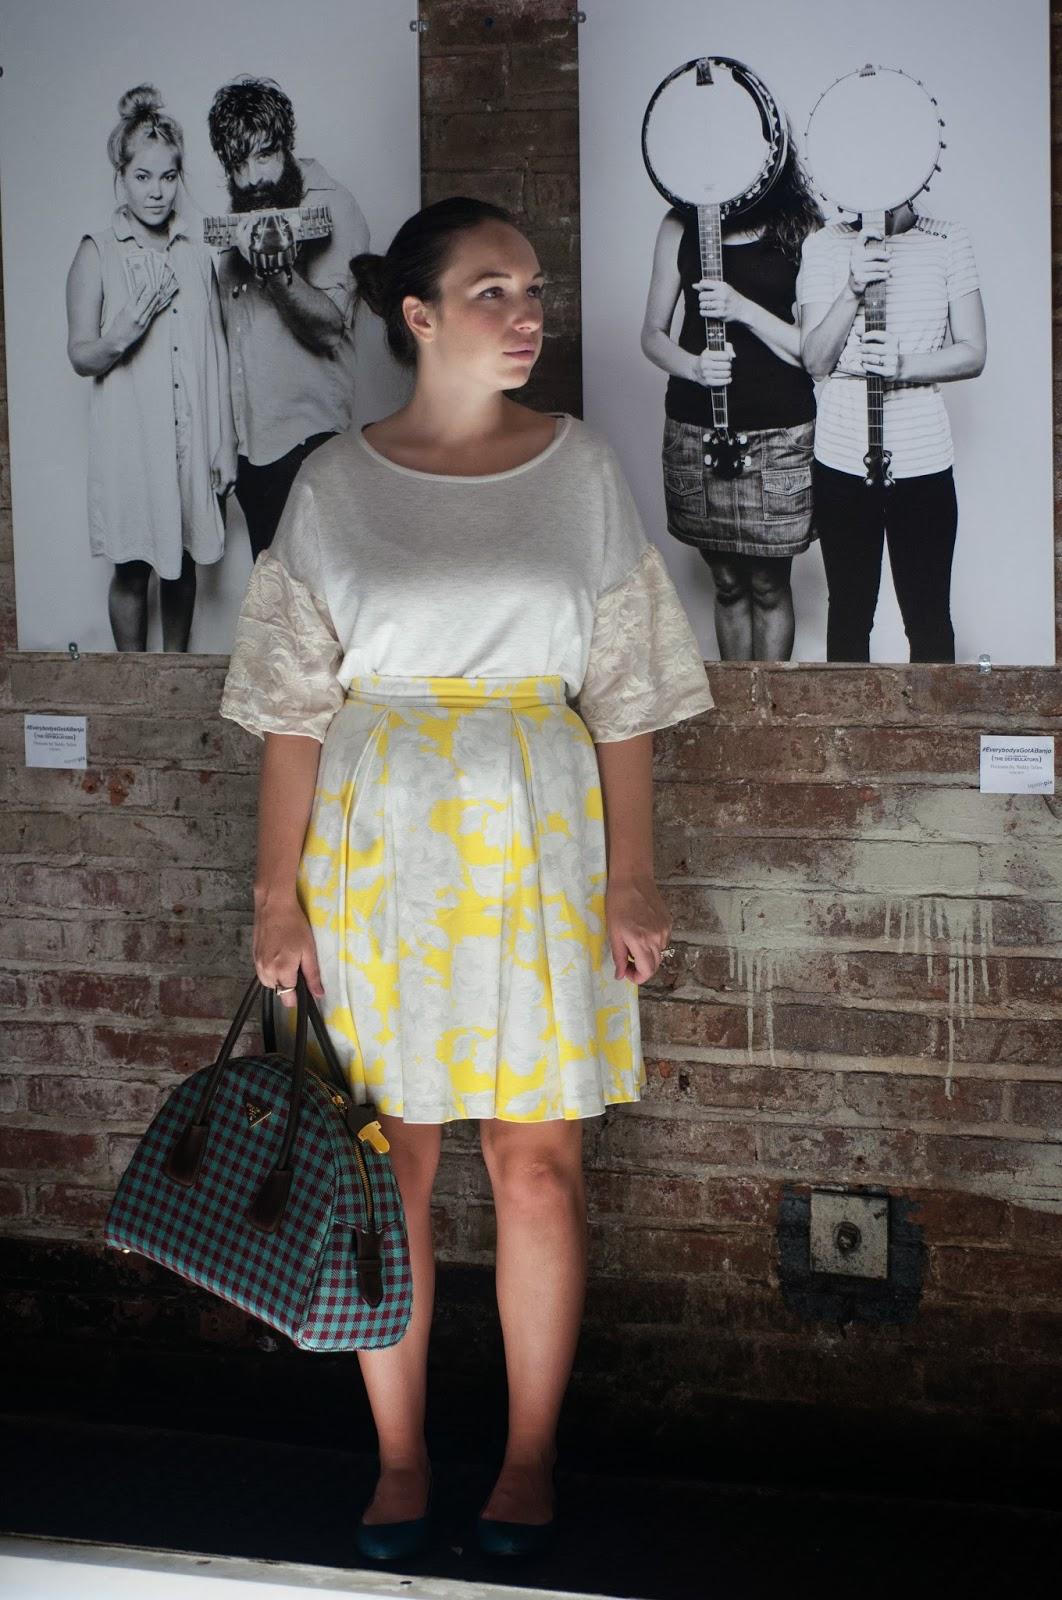 mens fashion blog, mens style blog, mens fashion, mens style, ootd, his and her fashion,